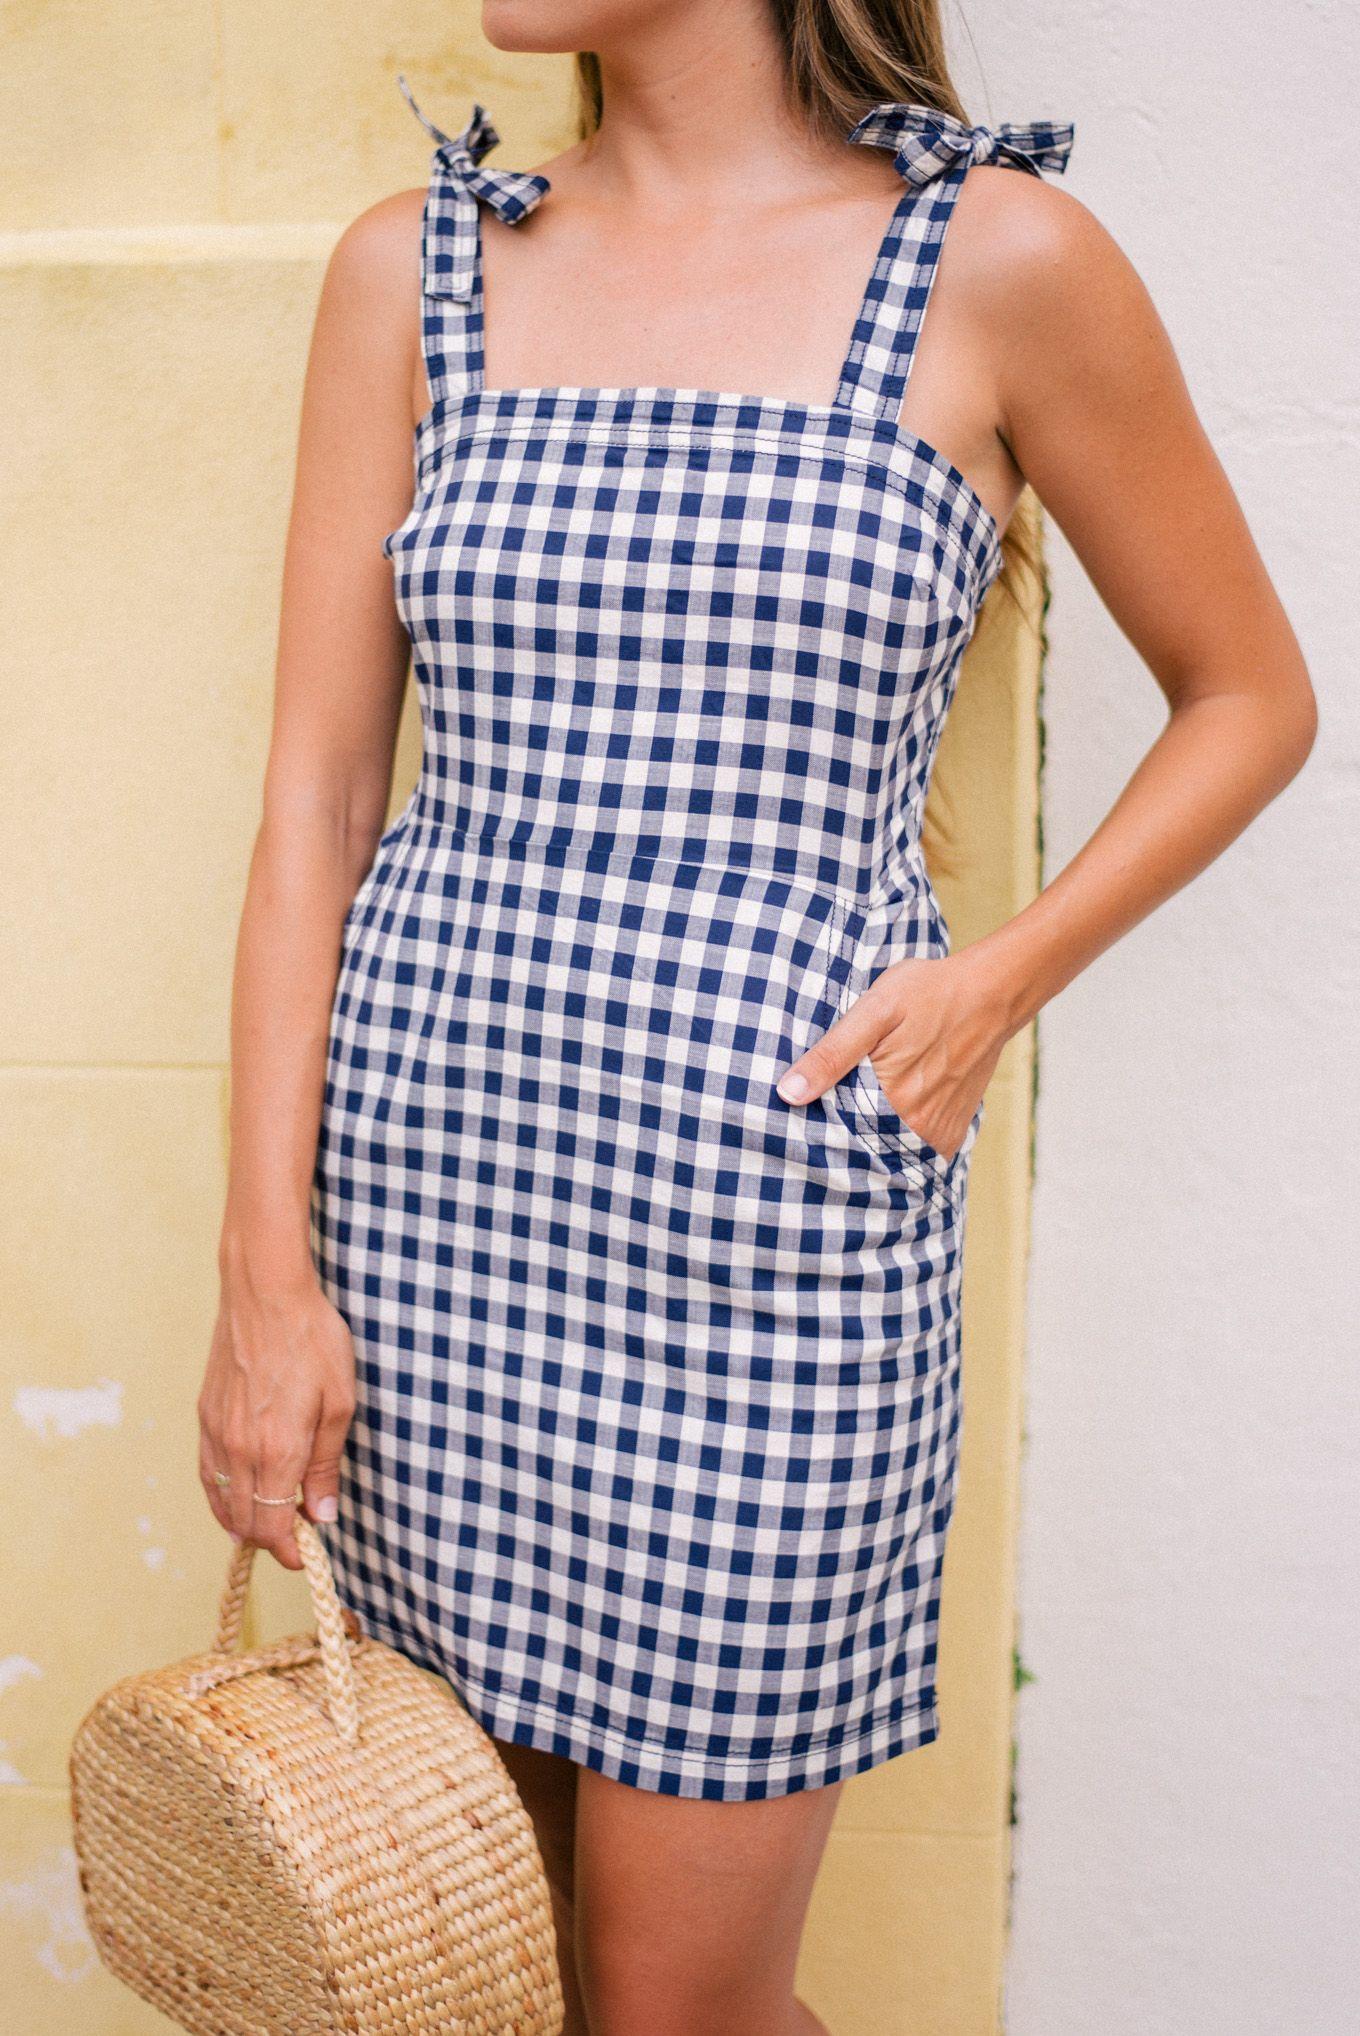 50ce7412564 Gal Meets Glam Gingham Mini Dress Express dress c o